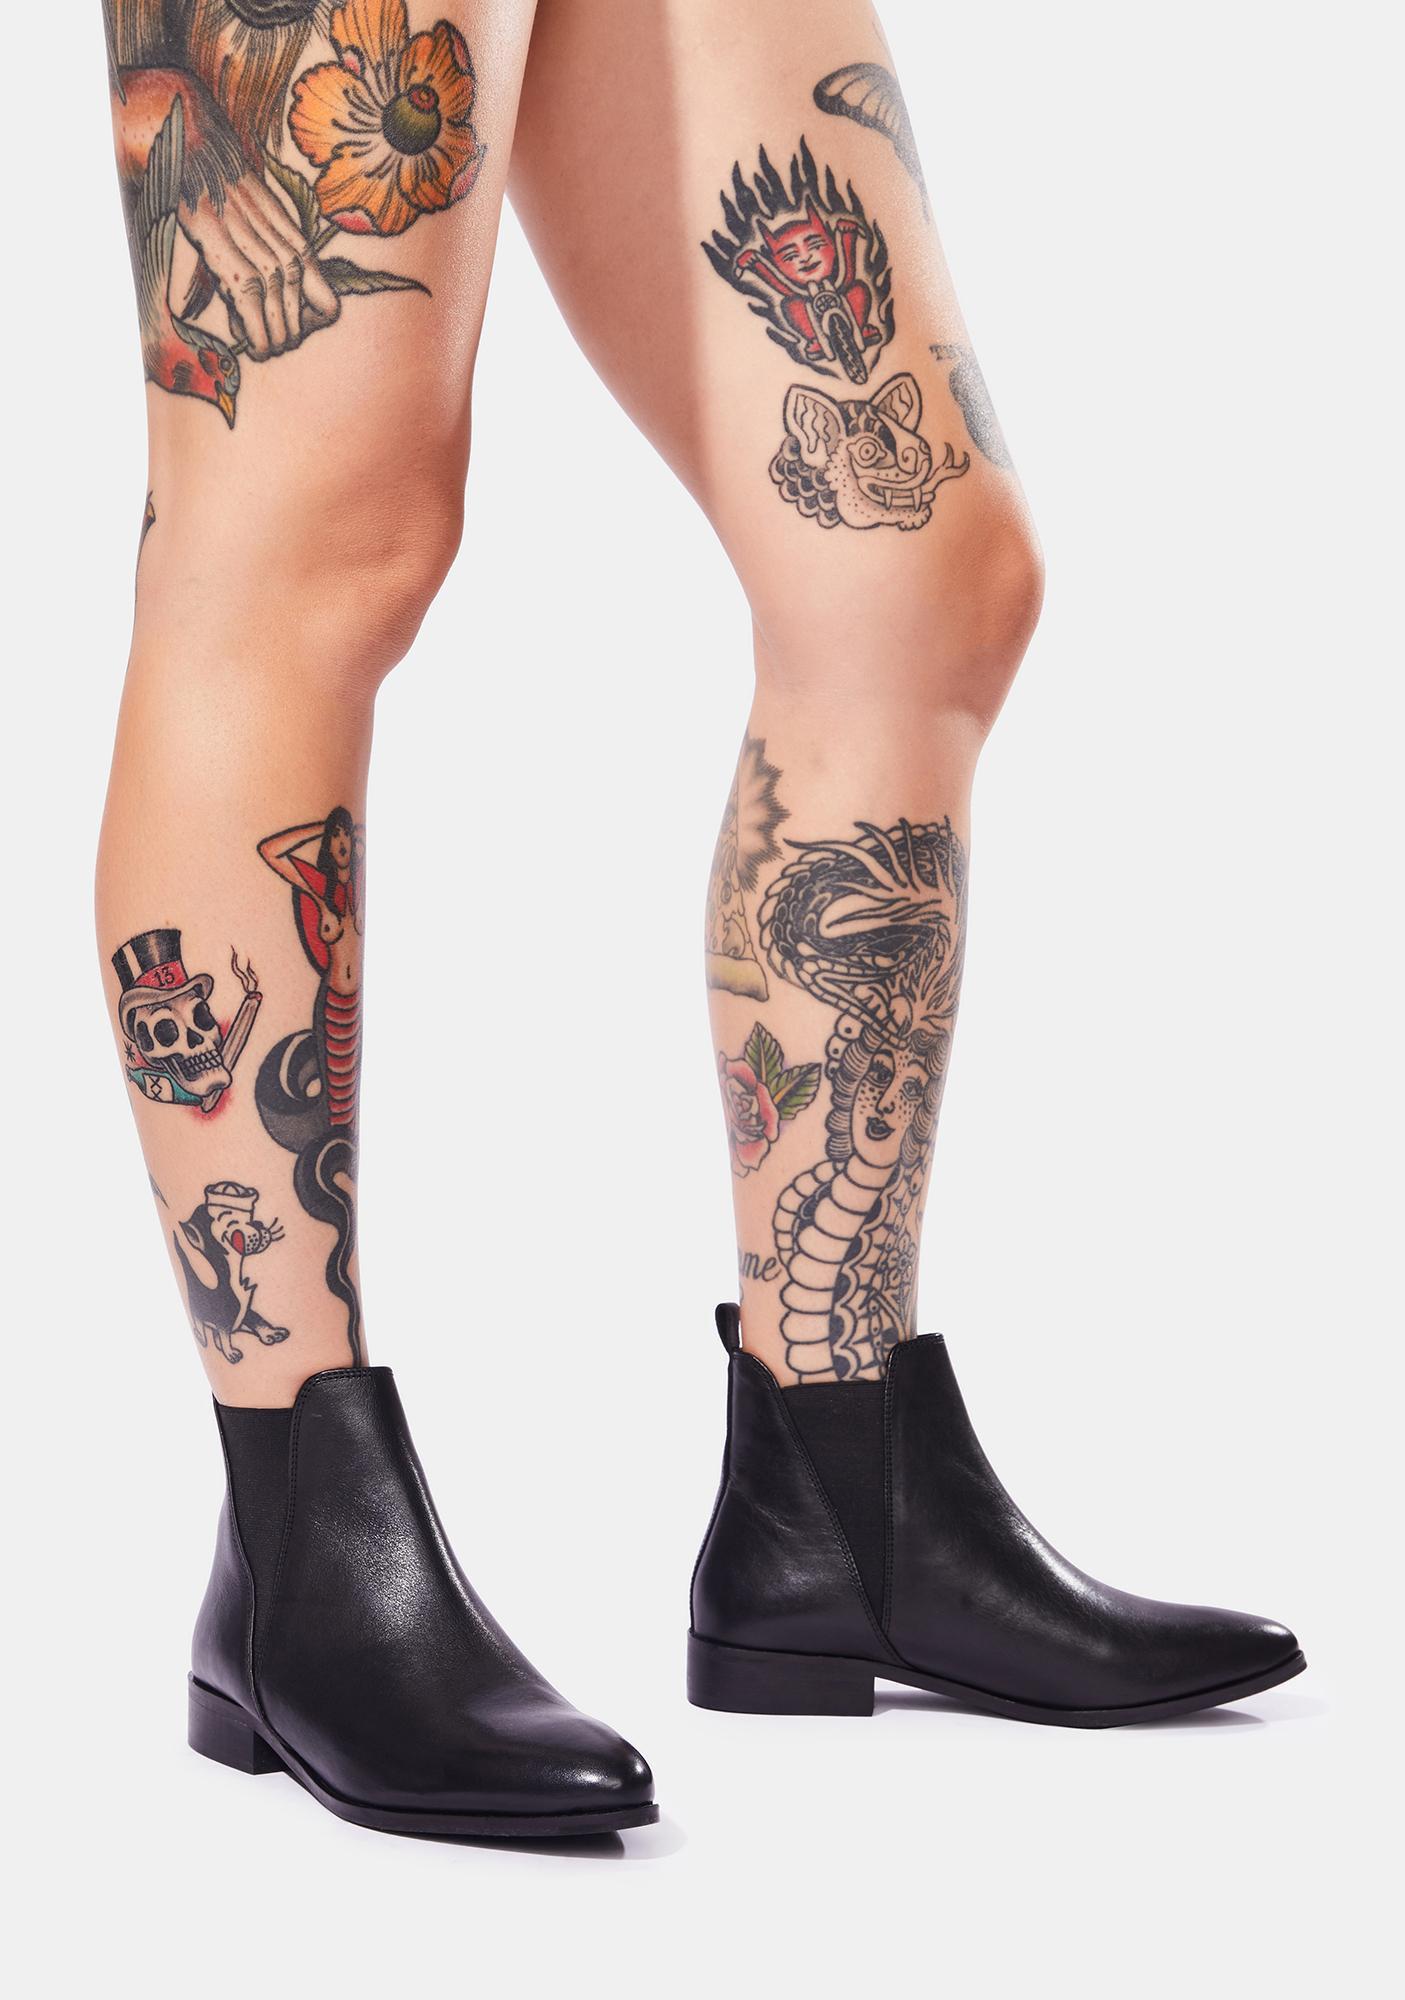 Chelsea Crew Black Label Rollo Ankle Boots